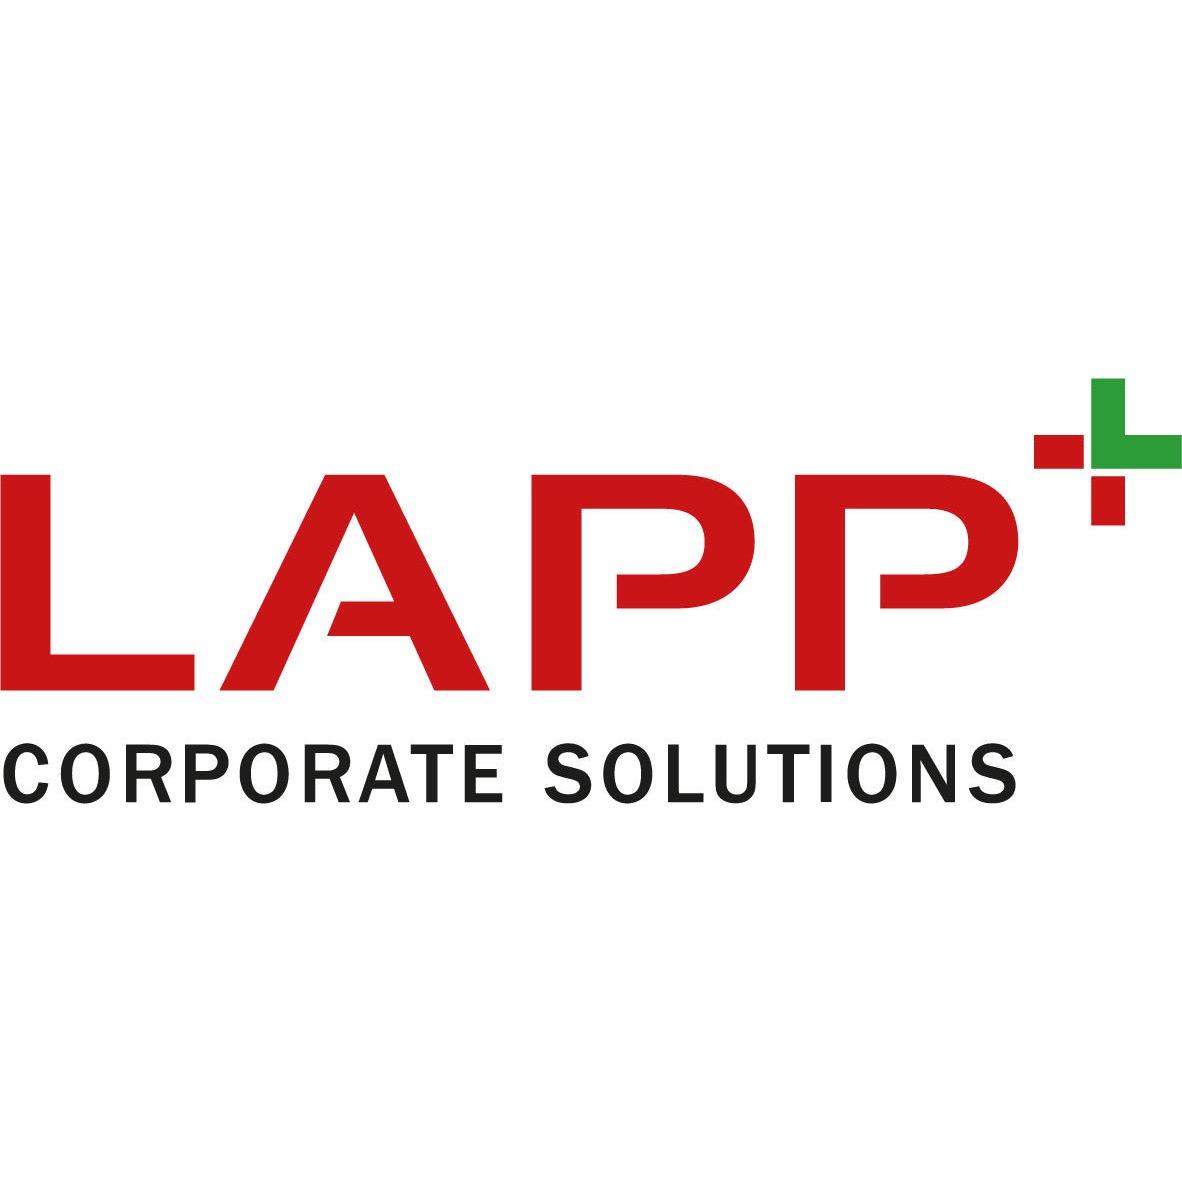 Lapp OHG Xerox Vertragspartner